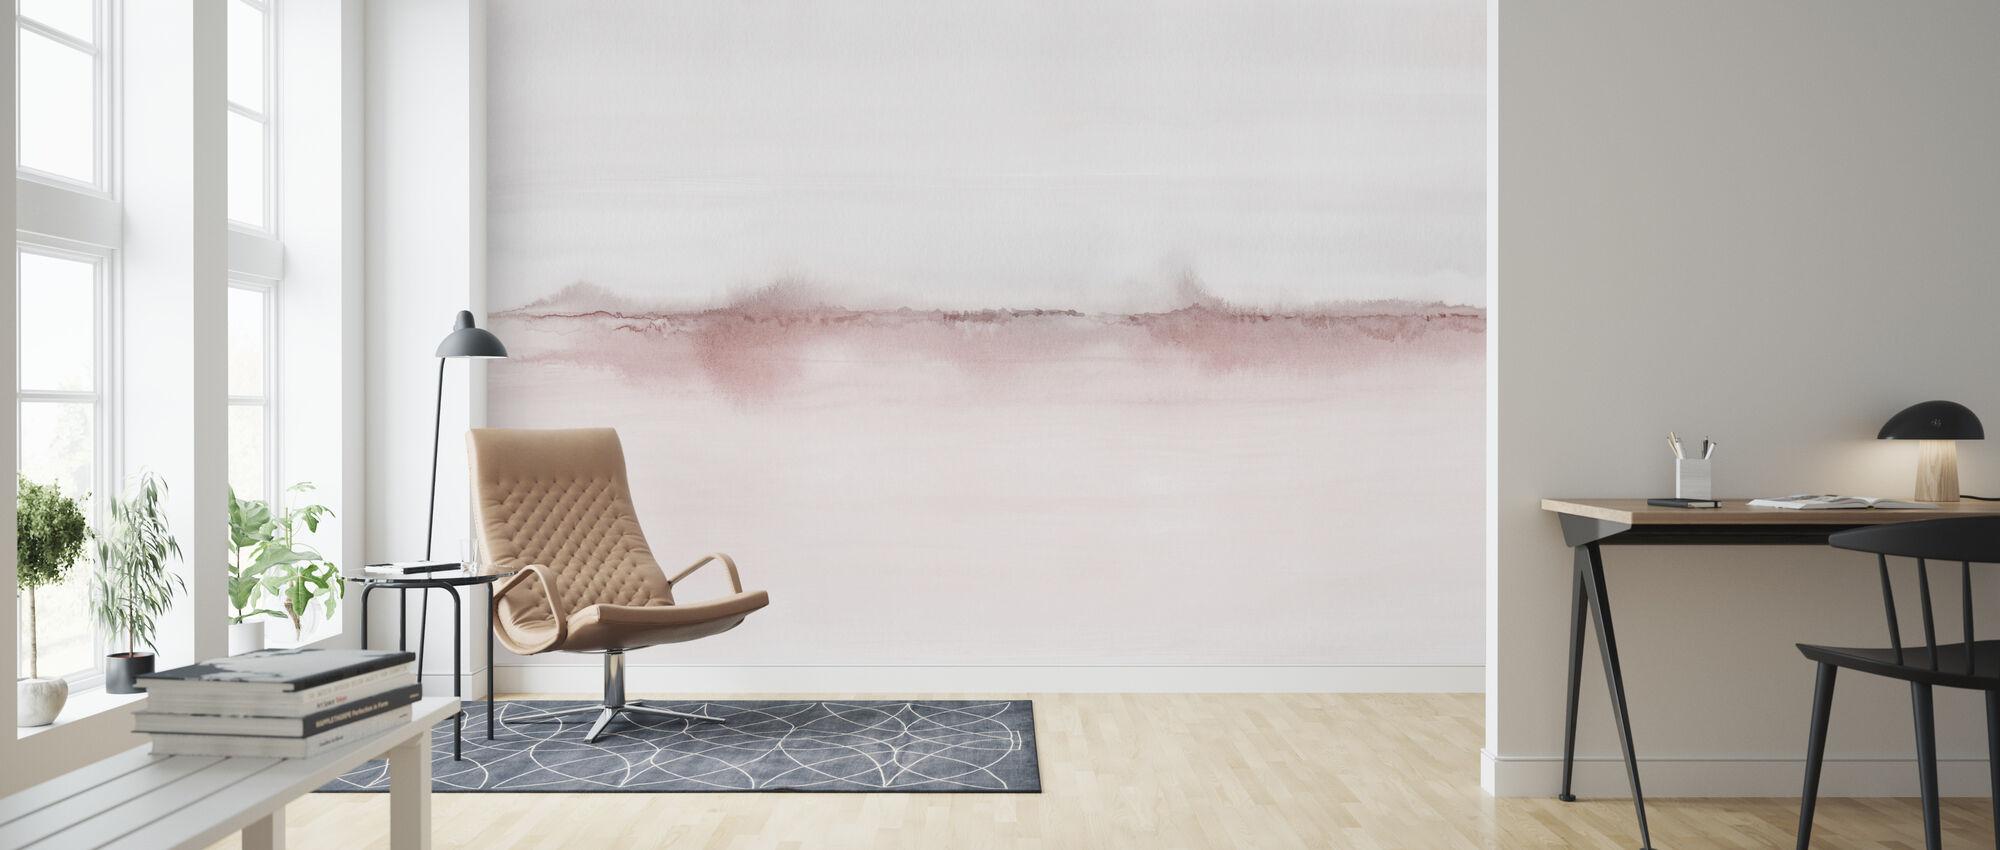 Watercolor Landscape VI - Pink and Gray - Wallpaper - Living Room